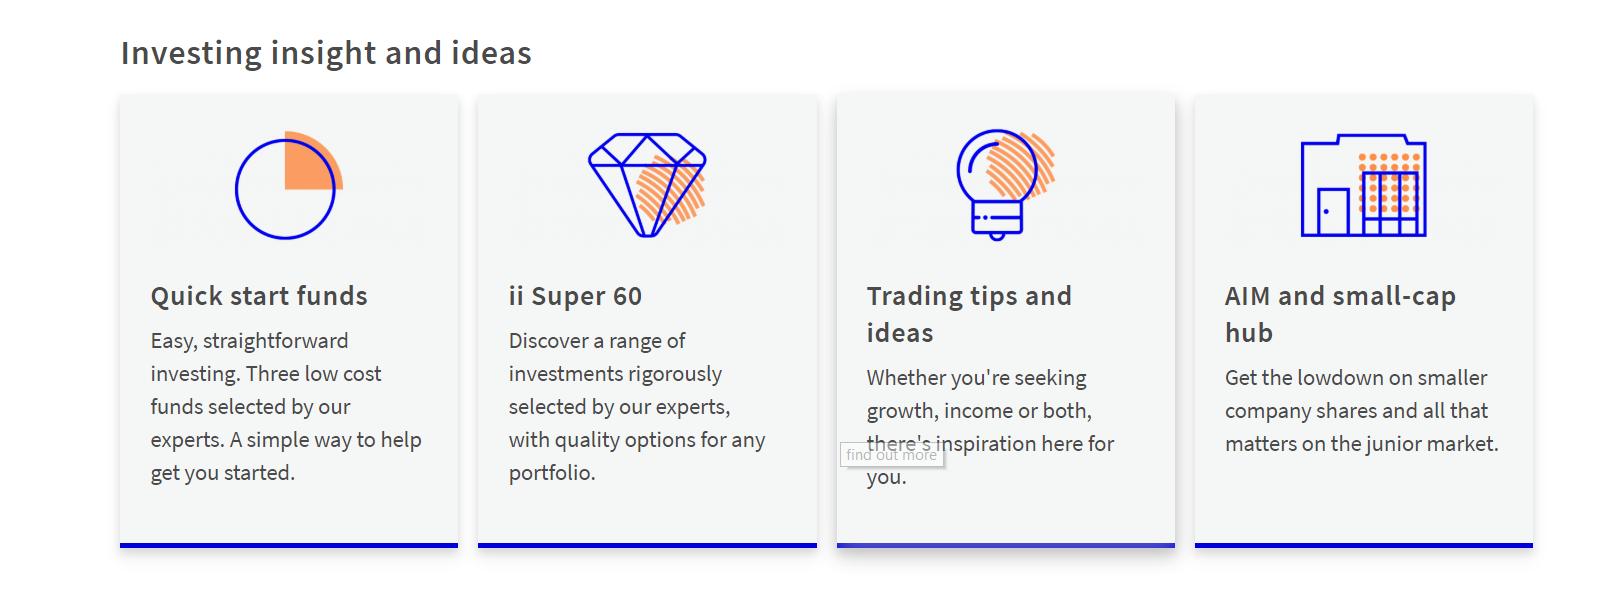 interactive investors insight & ideas